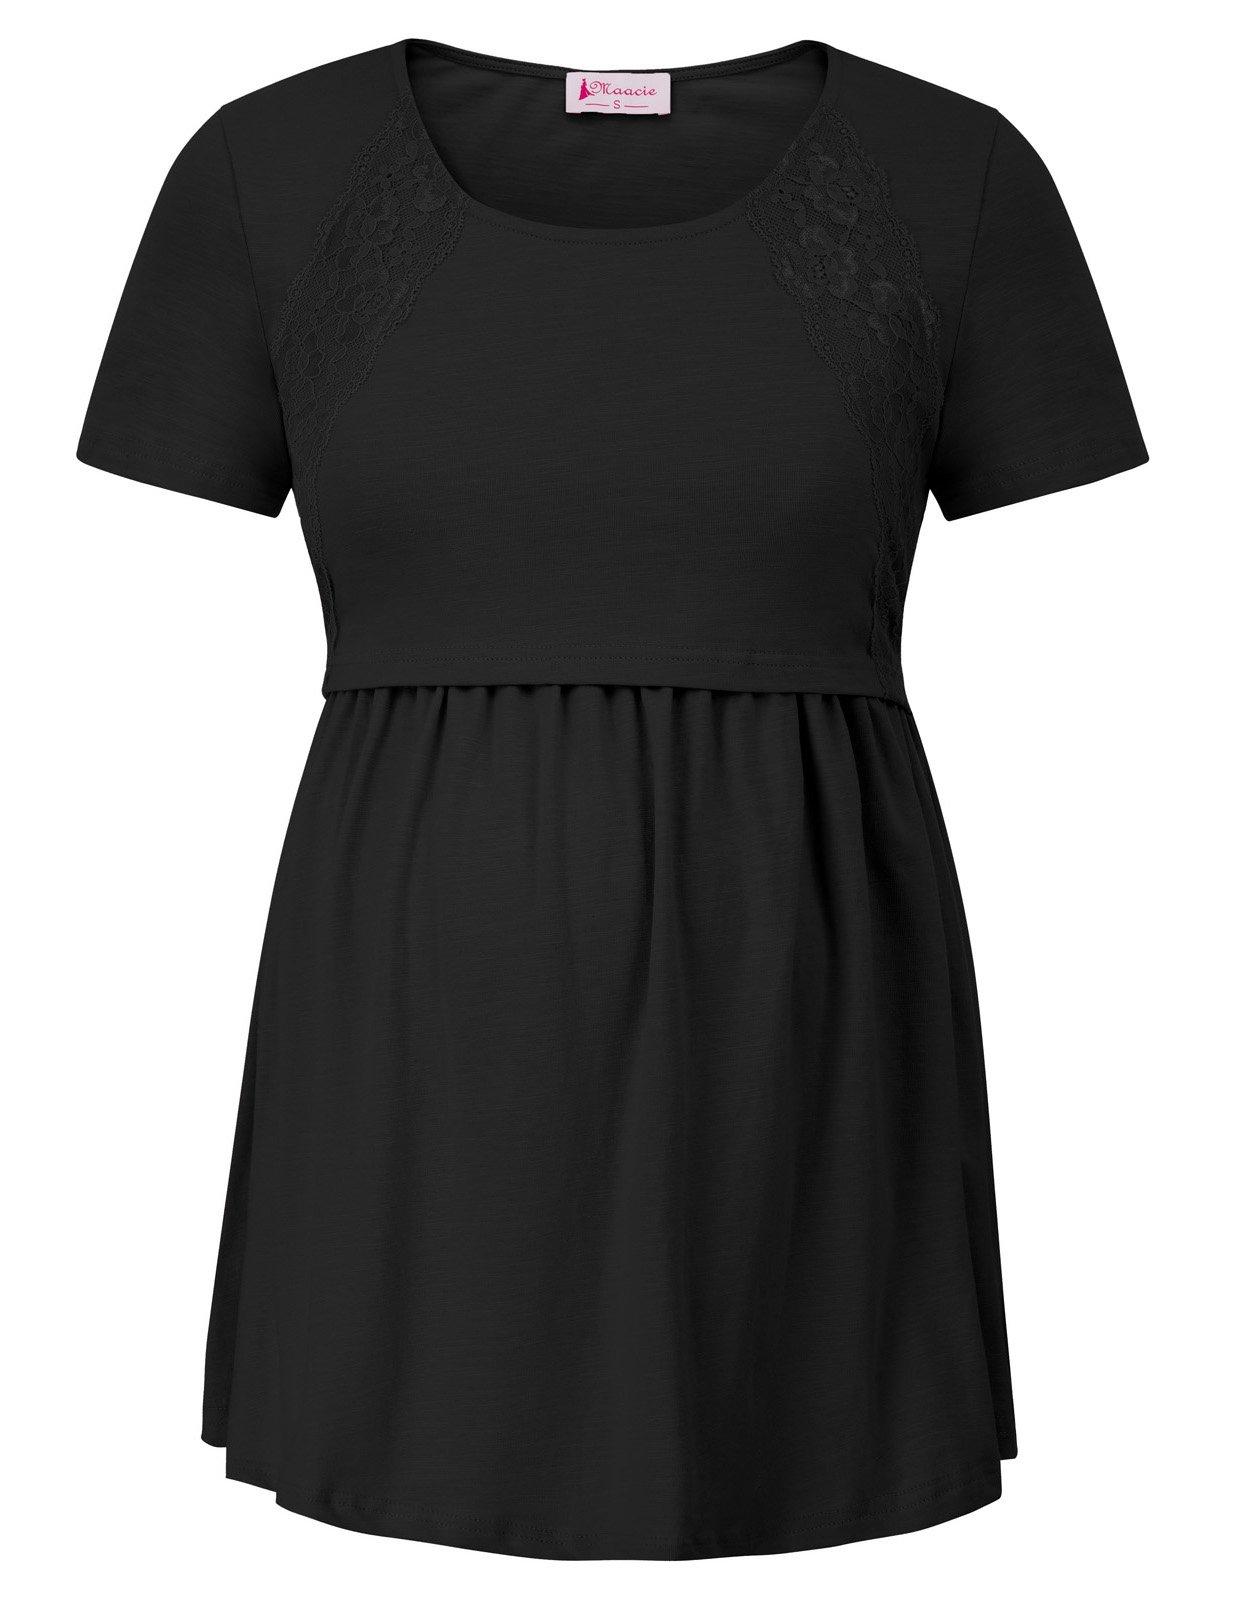 Women's Maternity Short Sleeve Solid Color Breastfeeding T-Shirt Black 2XL